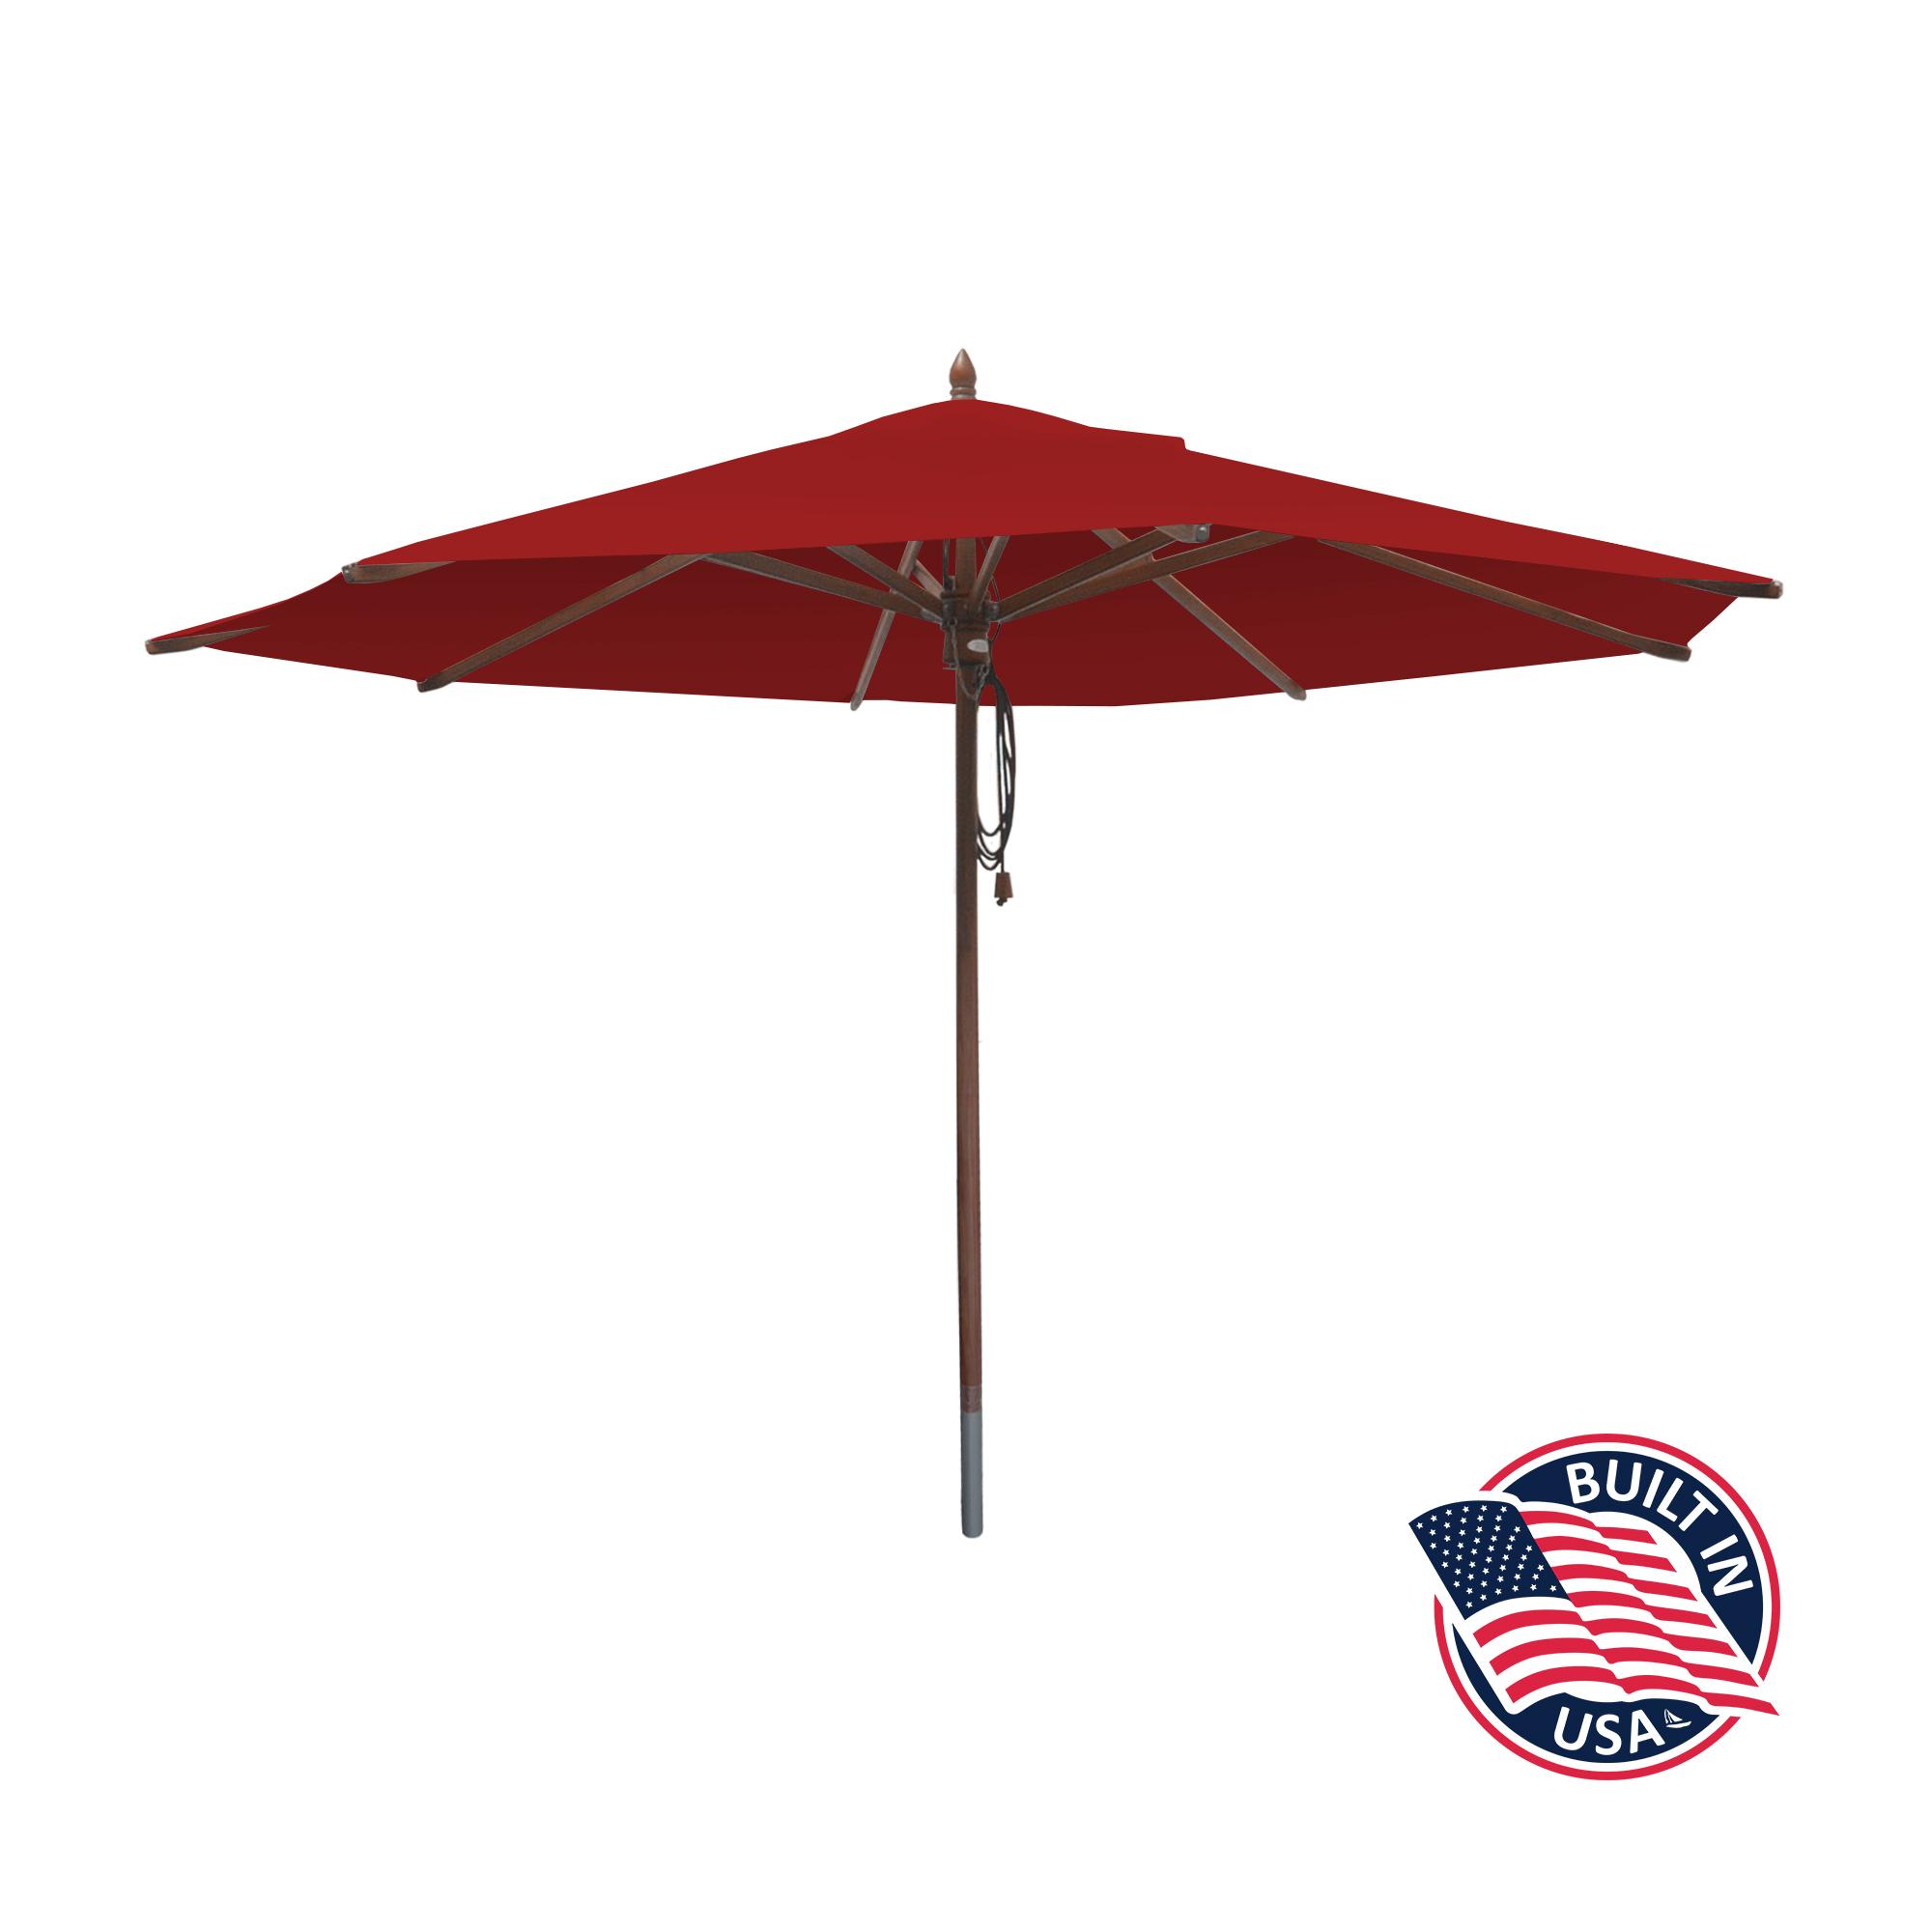 11' Octagon Patio Umbrella